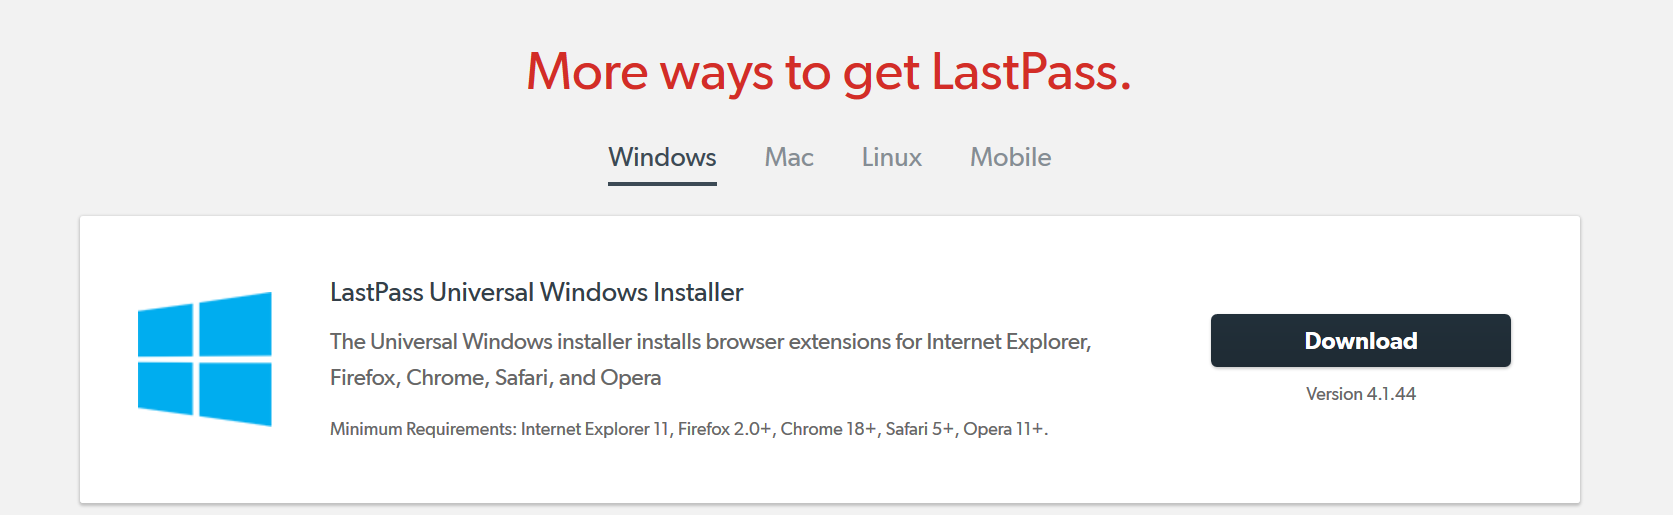 Lastpass For Safari Mac 1